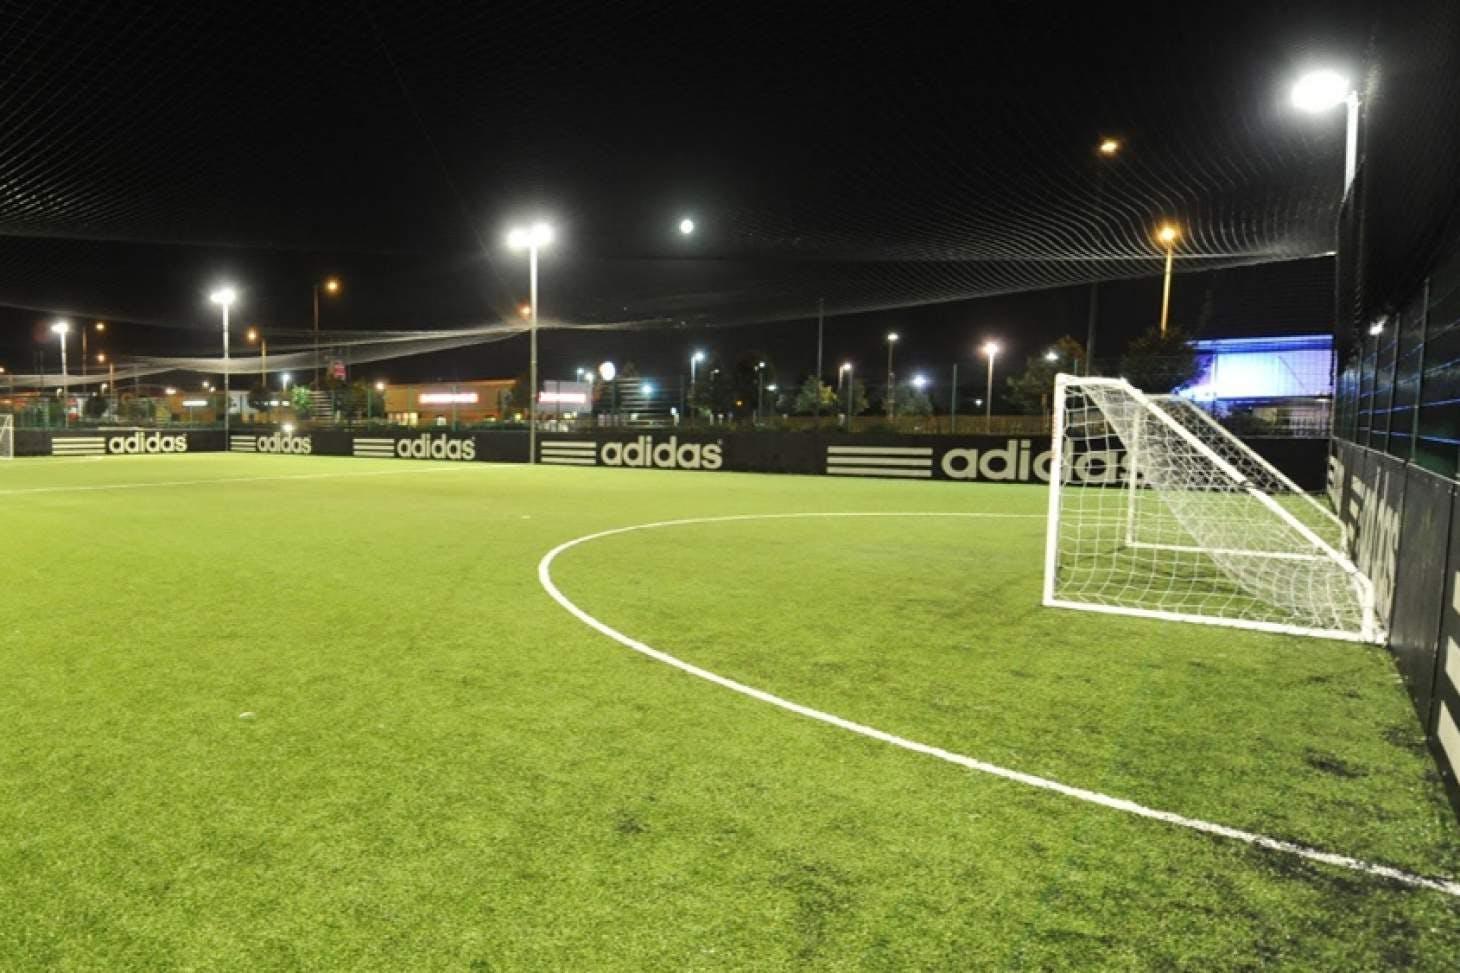 PlayFootball Liverpool 5 a side | 3G Astroturf football pitch